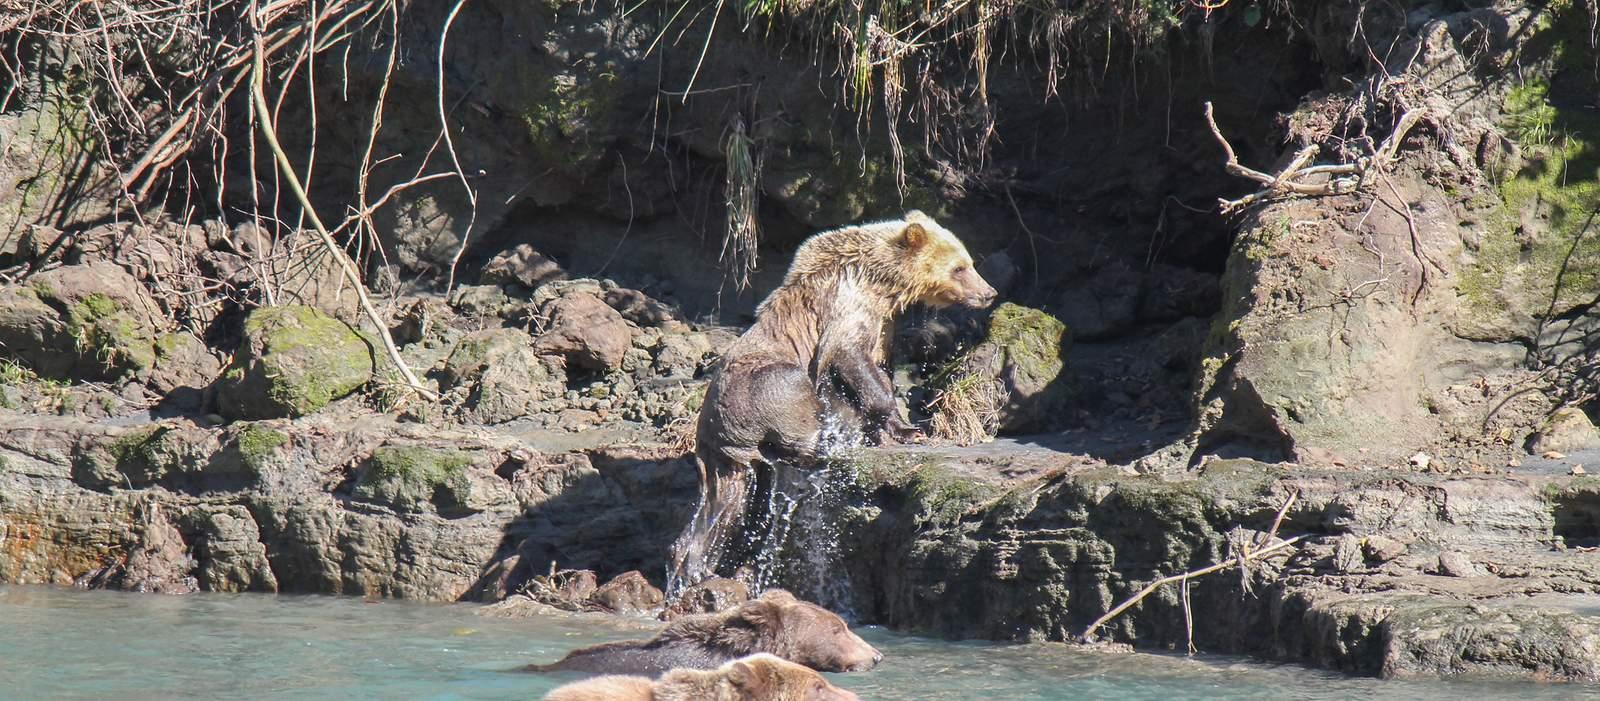 Bär nahe der Homfray Lodge am Desolation Sound